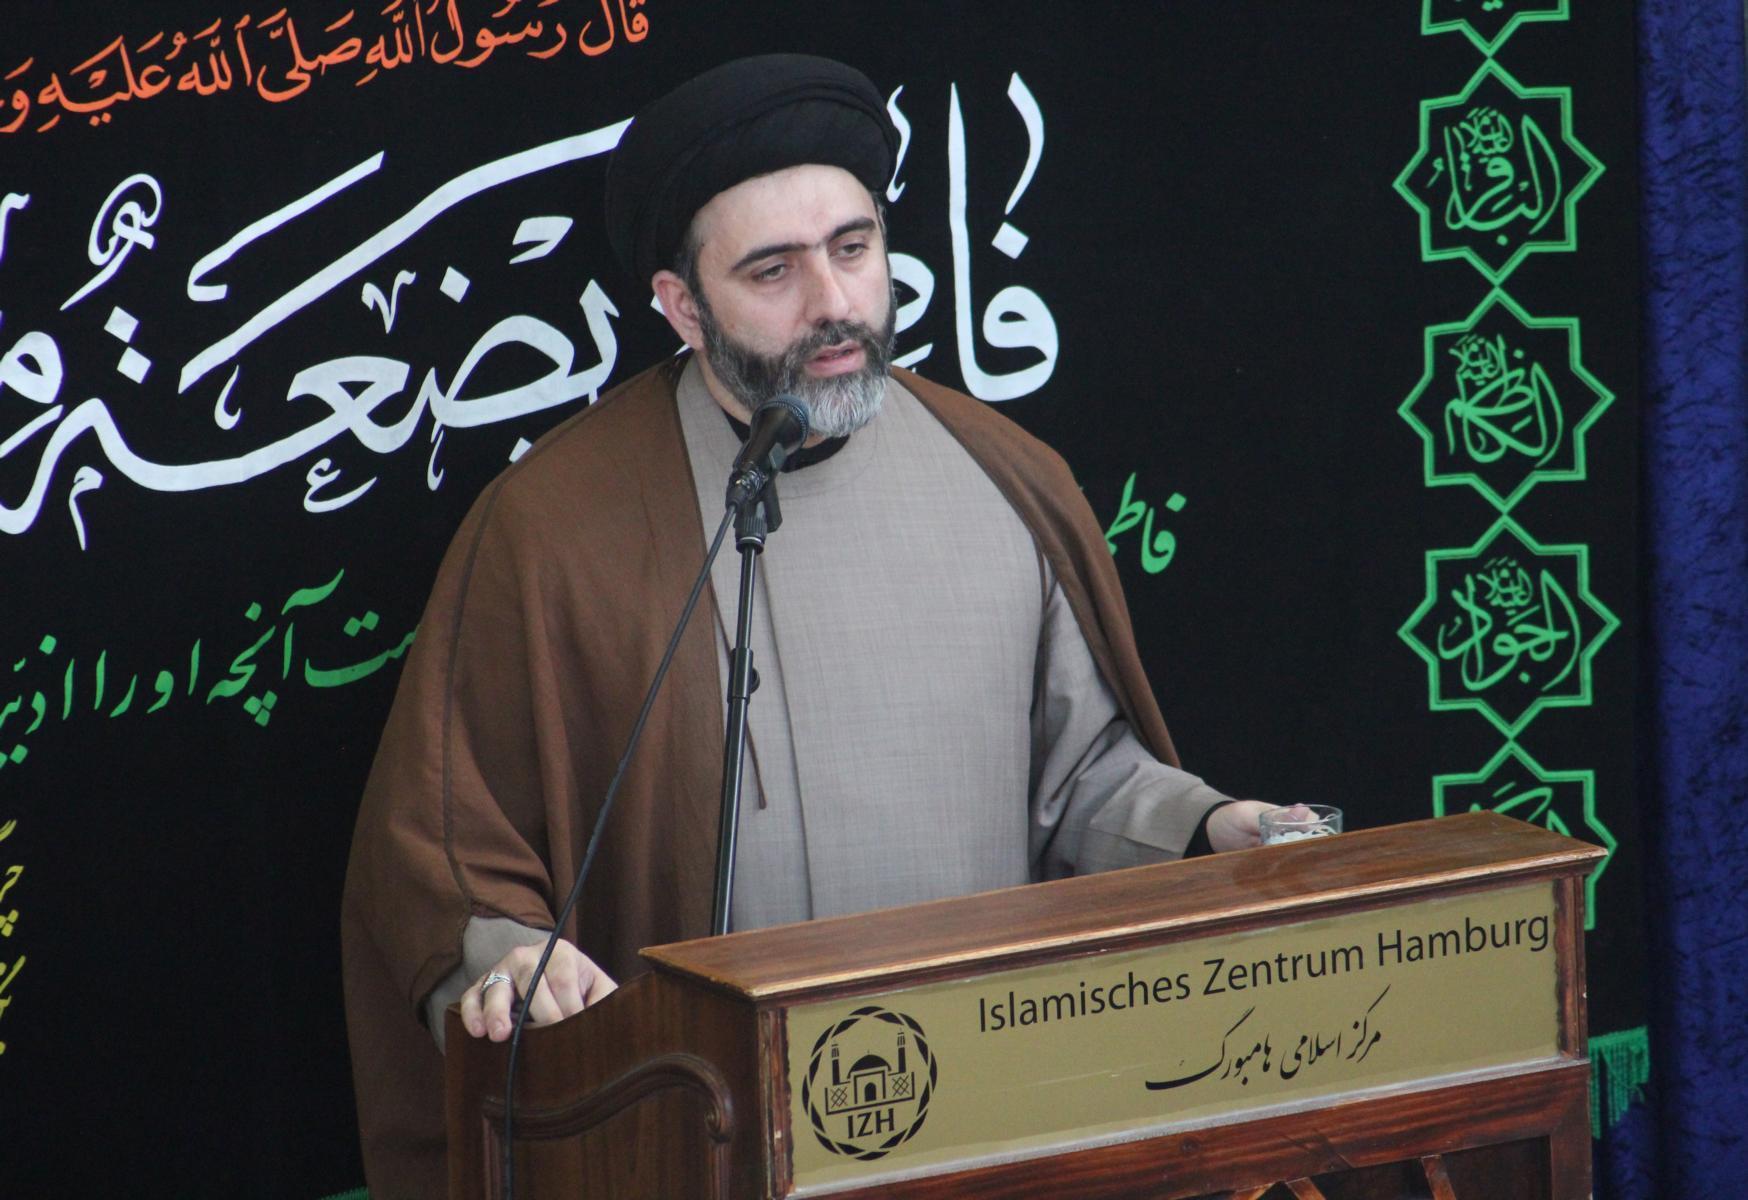 حجت الاسلام موسوی معاون مرکز اسلامی هامبورگ